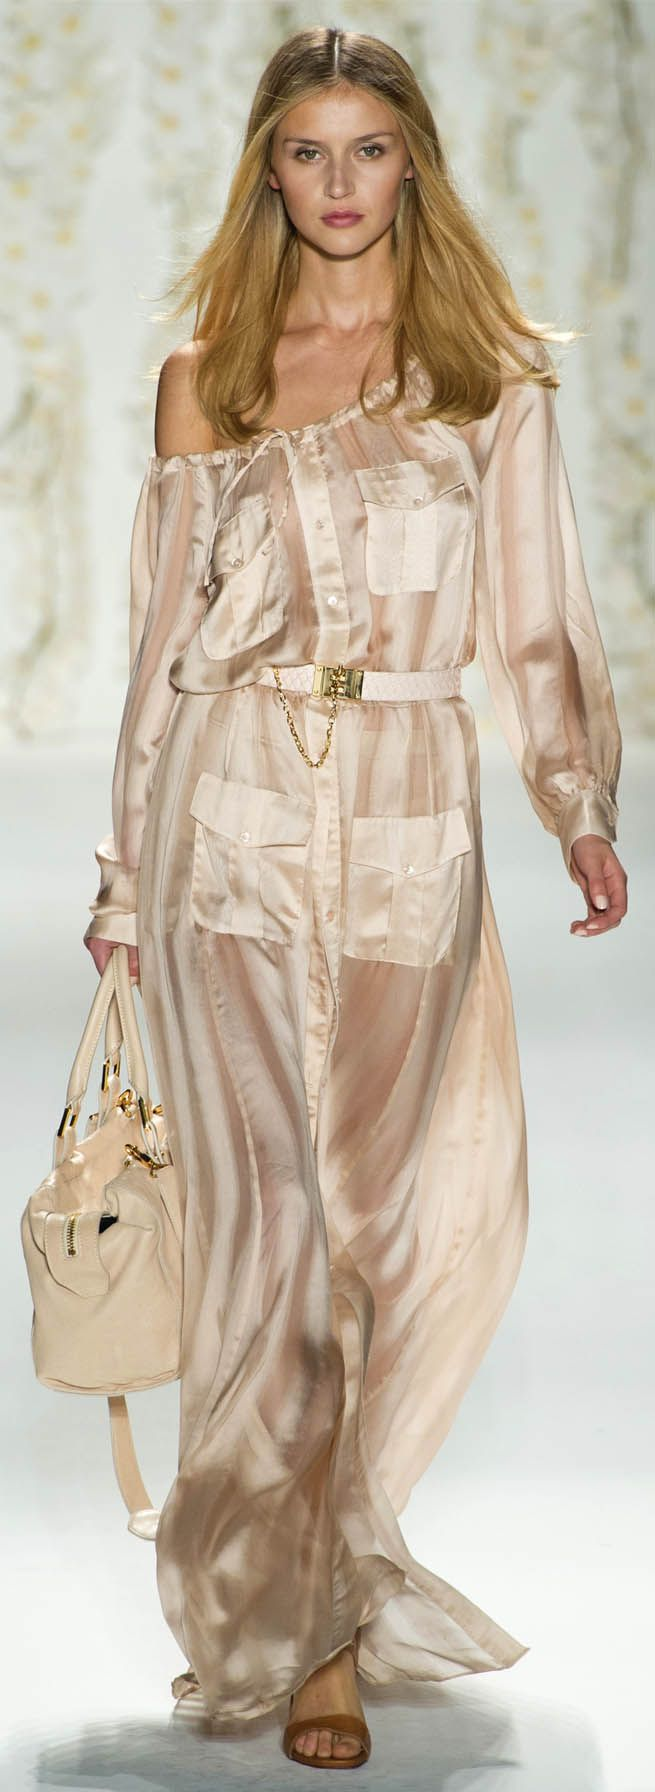 Rachel Zoe Spring Summer 2013 Ready To Wear Collection #rachel zoe # fashion #women